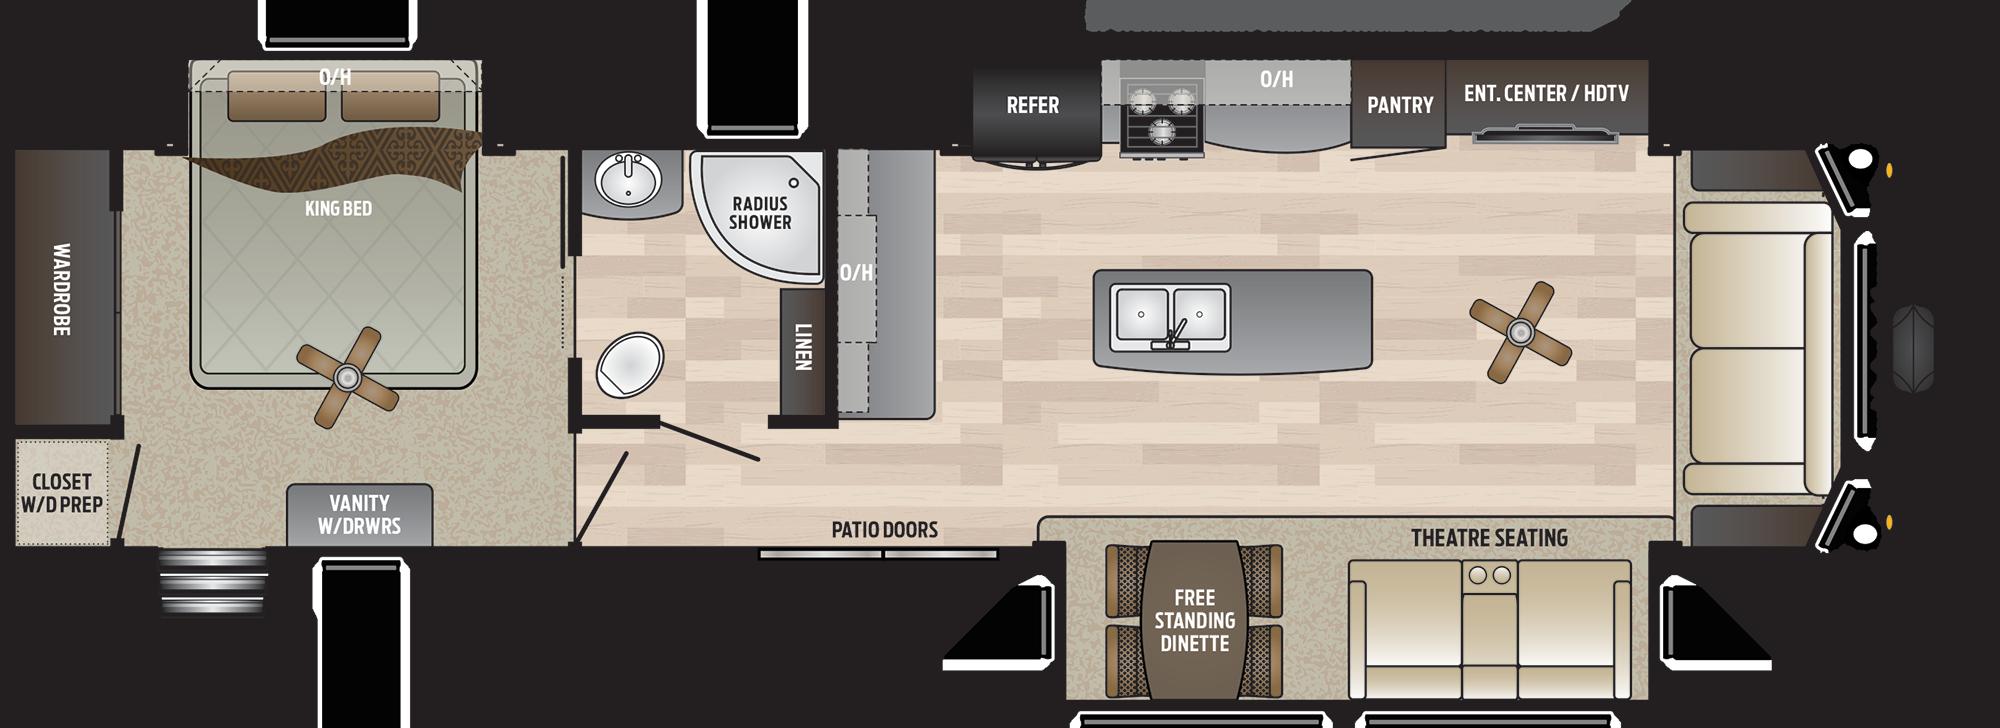 2019 KEYSTONE RETREAT 39MKTS (couples) Floorplan